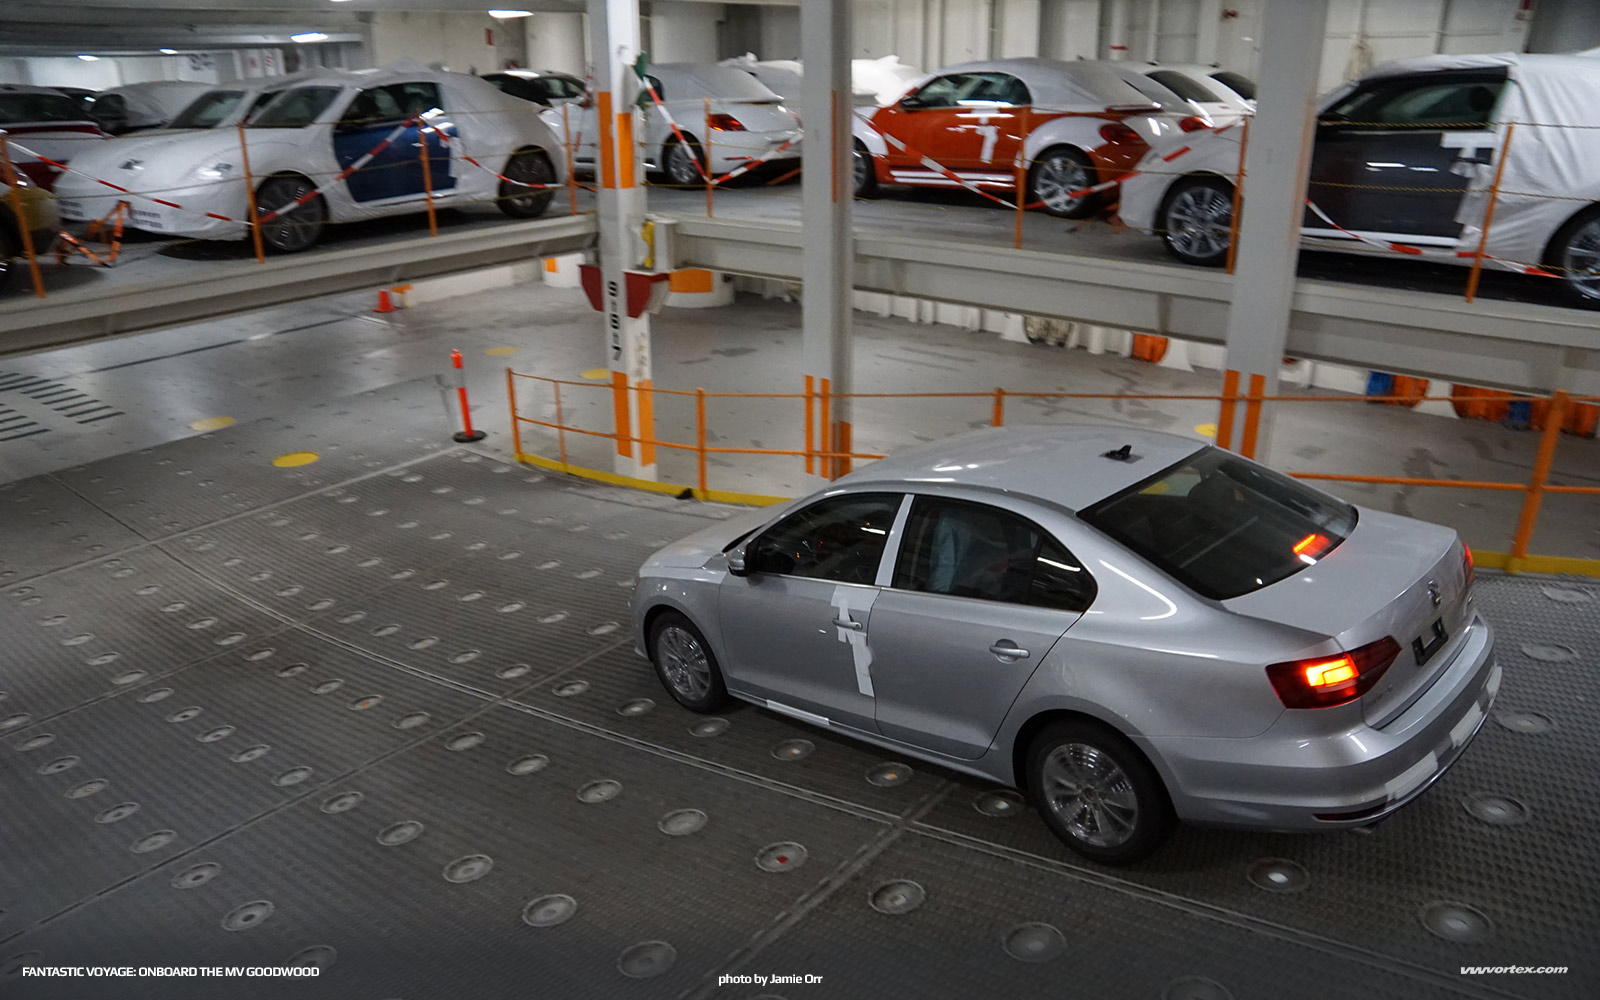 Audi R Searches Increase Per Cent On KBBcom Following Super - Audi r8 commercial